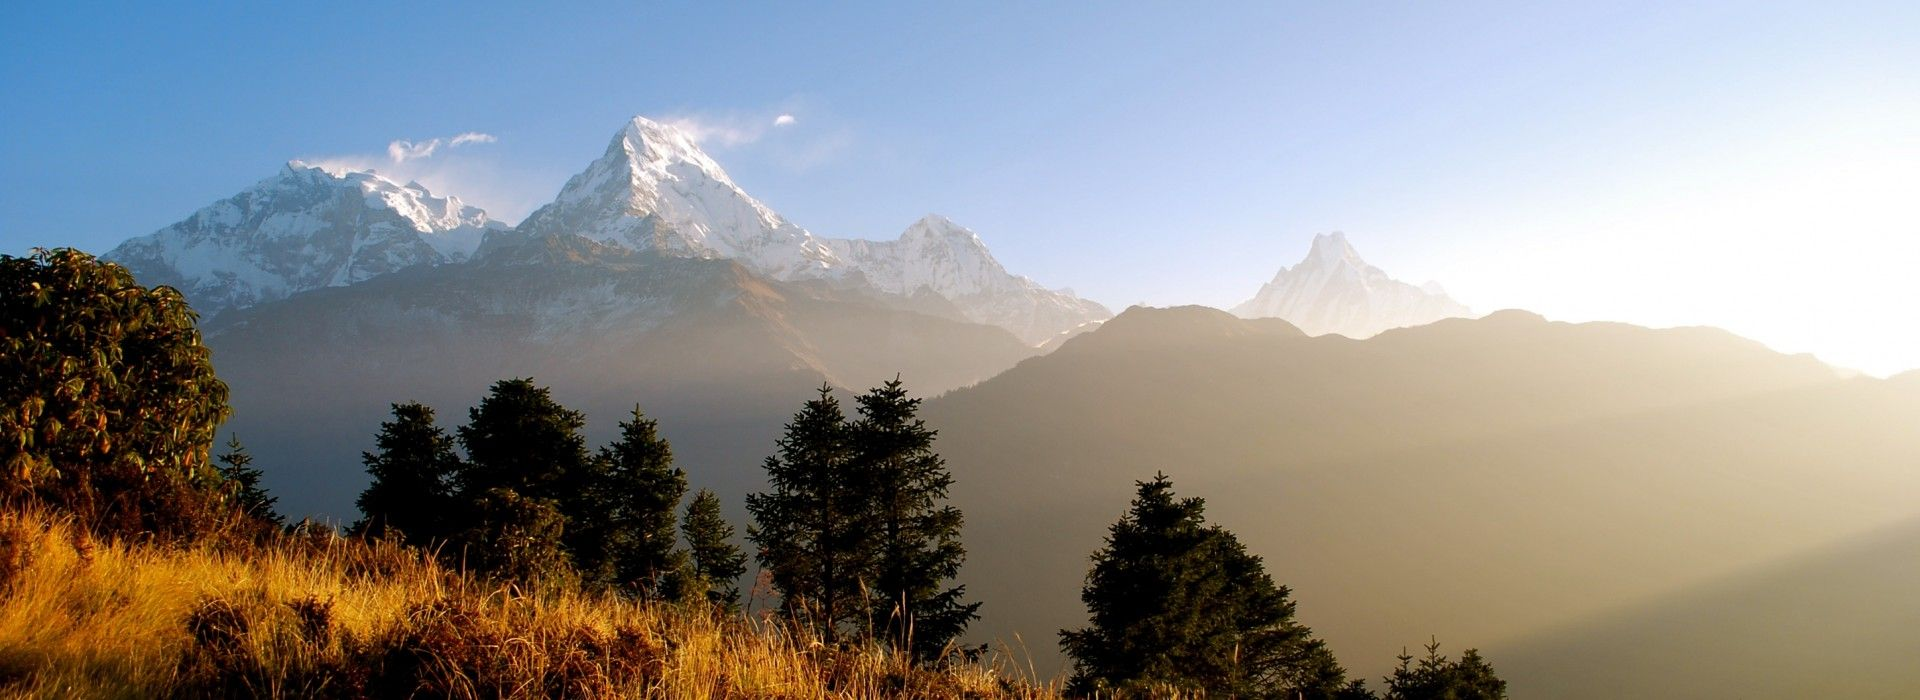 Climbing Tours in Everest Region